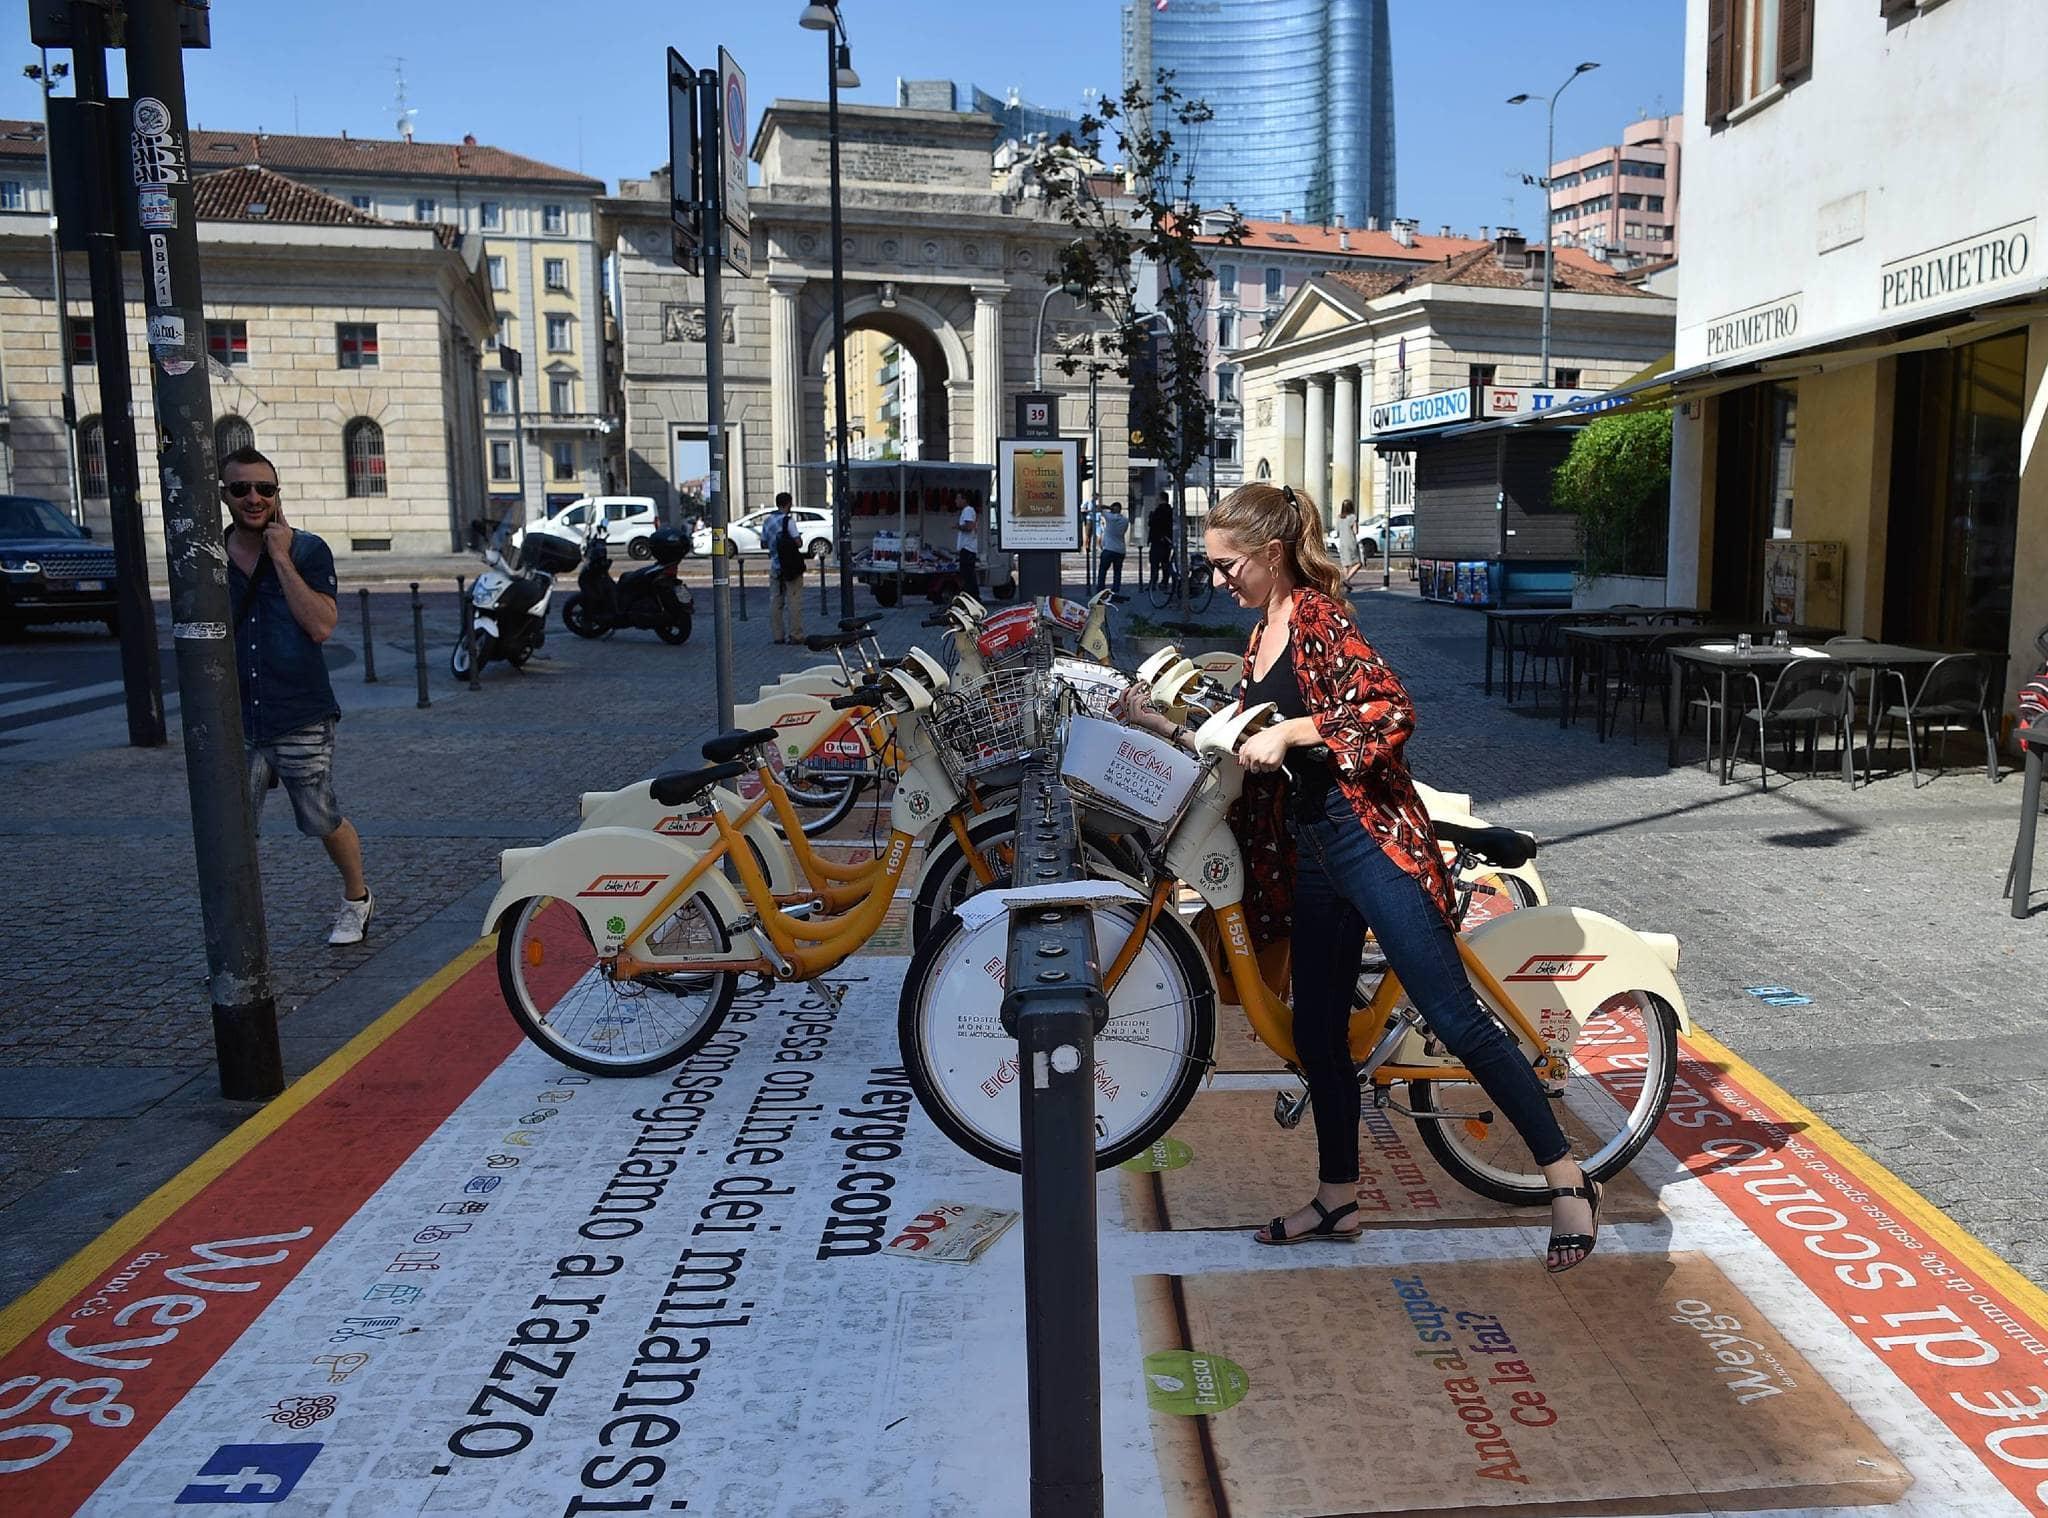 Milano allo studio il bike sharing sul modello shanghai for Mobile milano bike sharing